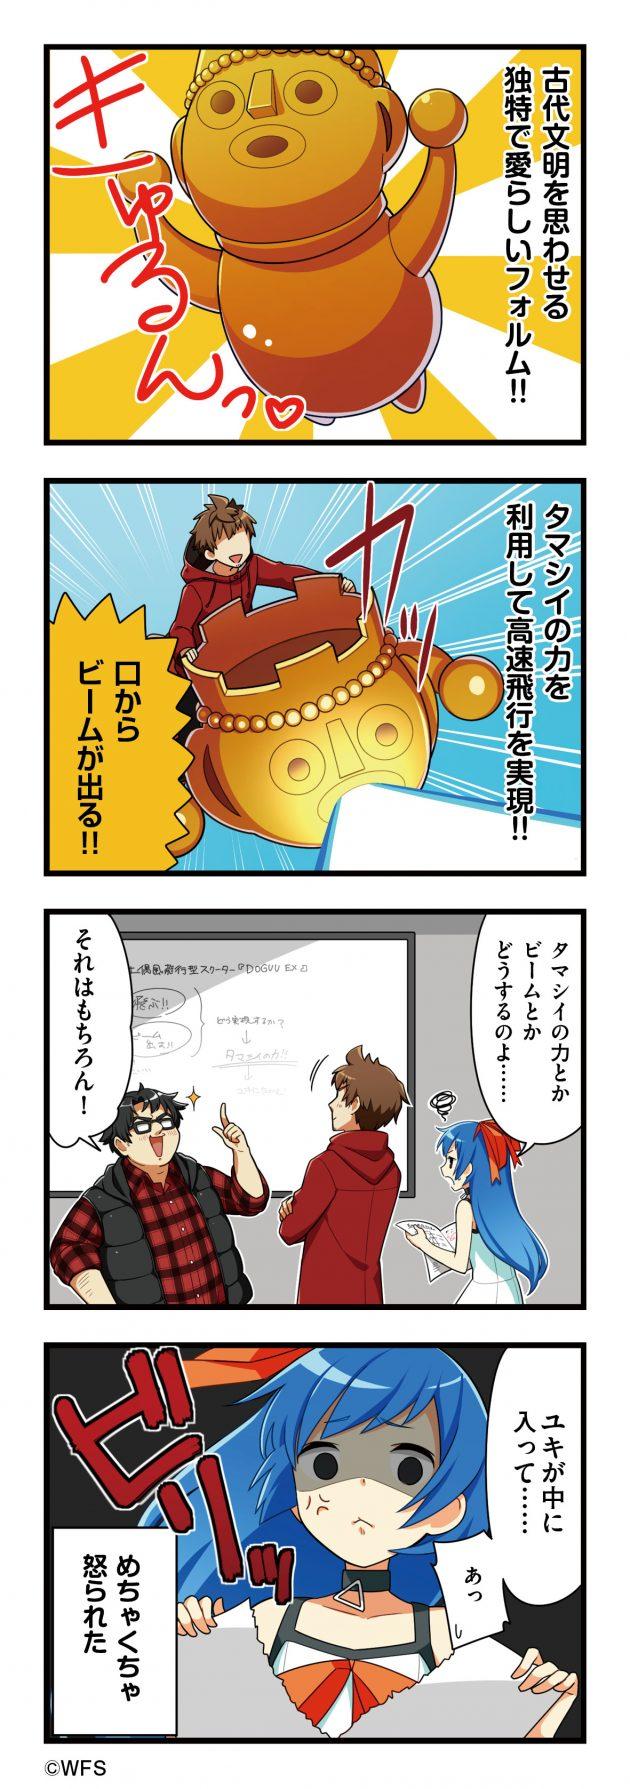 021_kuchikara_cut